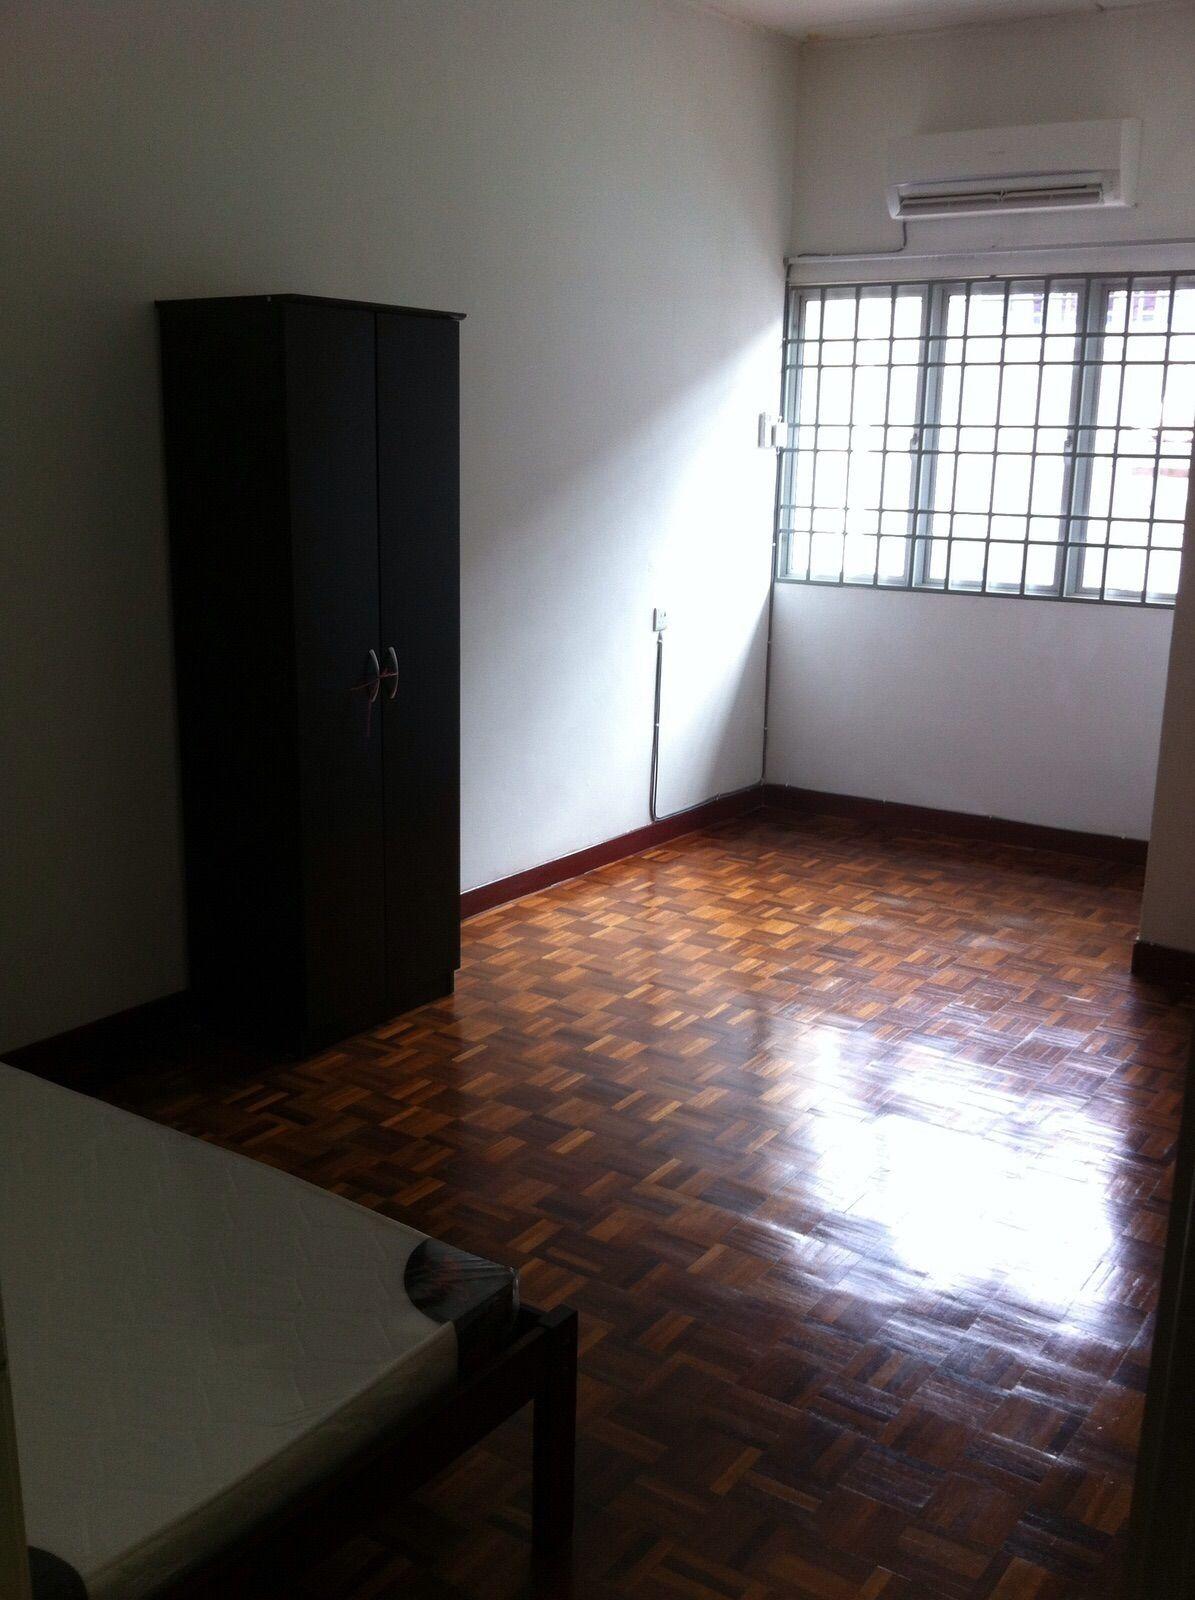 Suasana Bangsar Property, Renting a house, Kota damansara